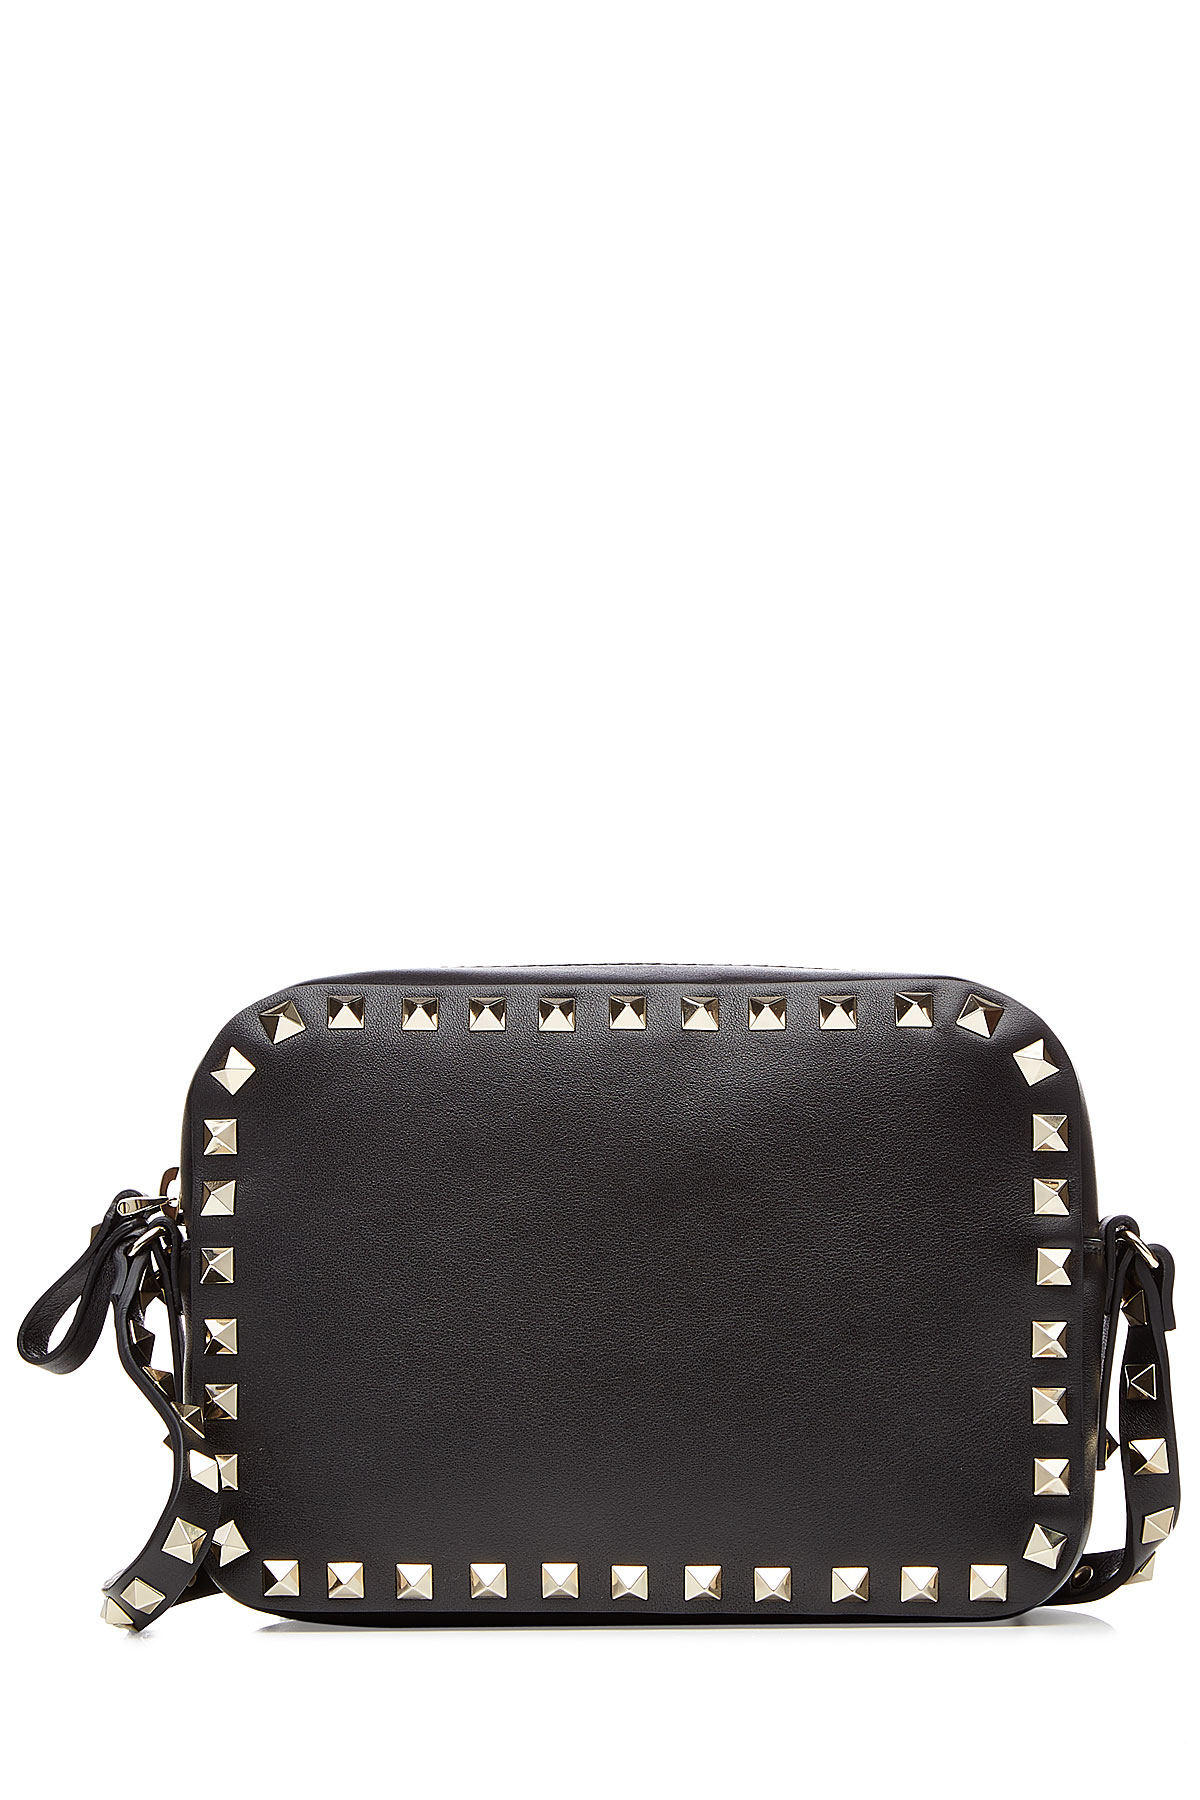 861c4089f0da Valentino Rockstud Leather Camera Bag - Black in Black